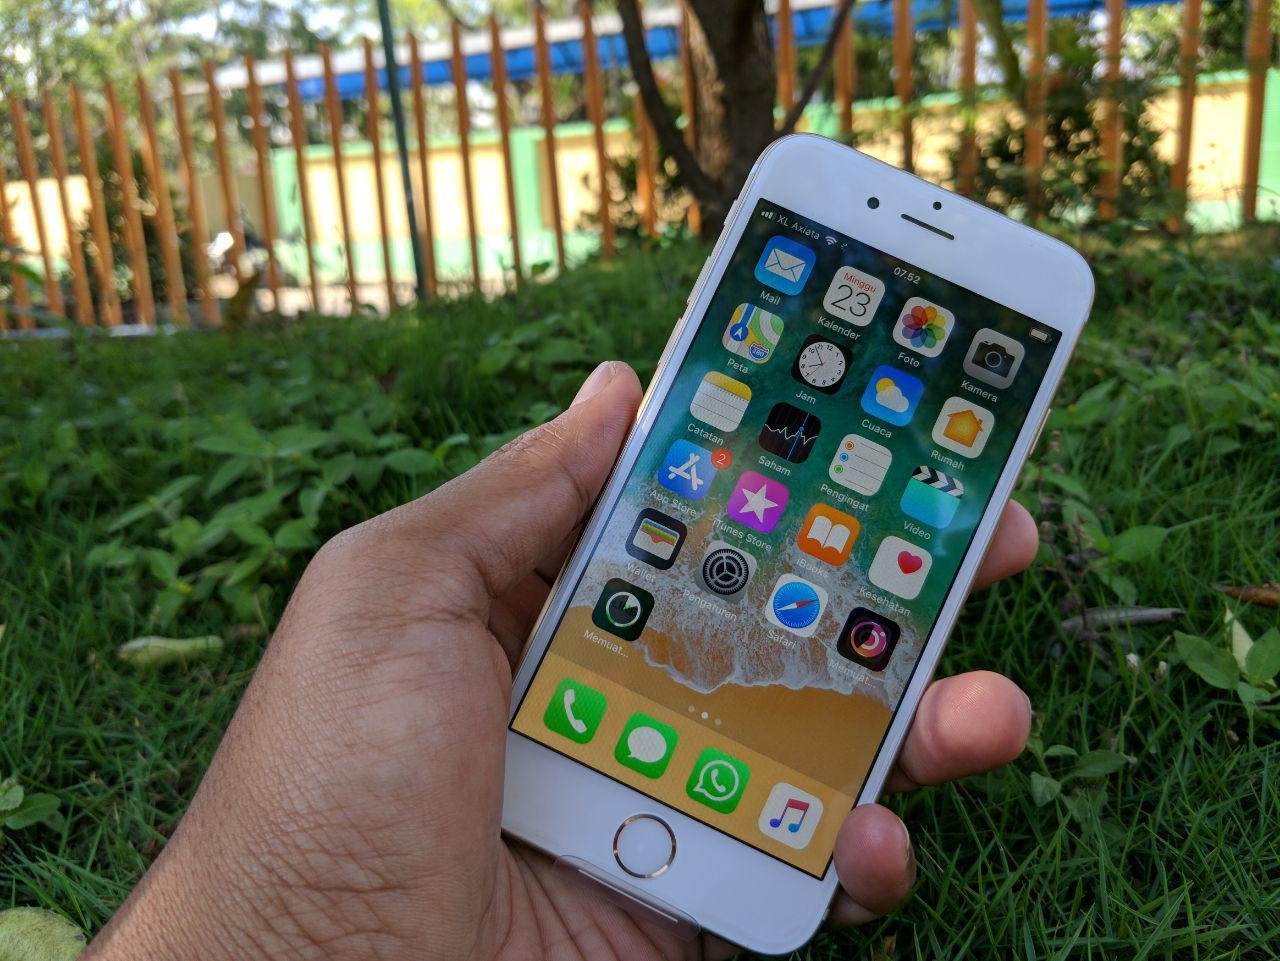 Masih Mulus Apple iPhone 6 32GB Gold